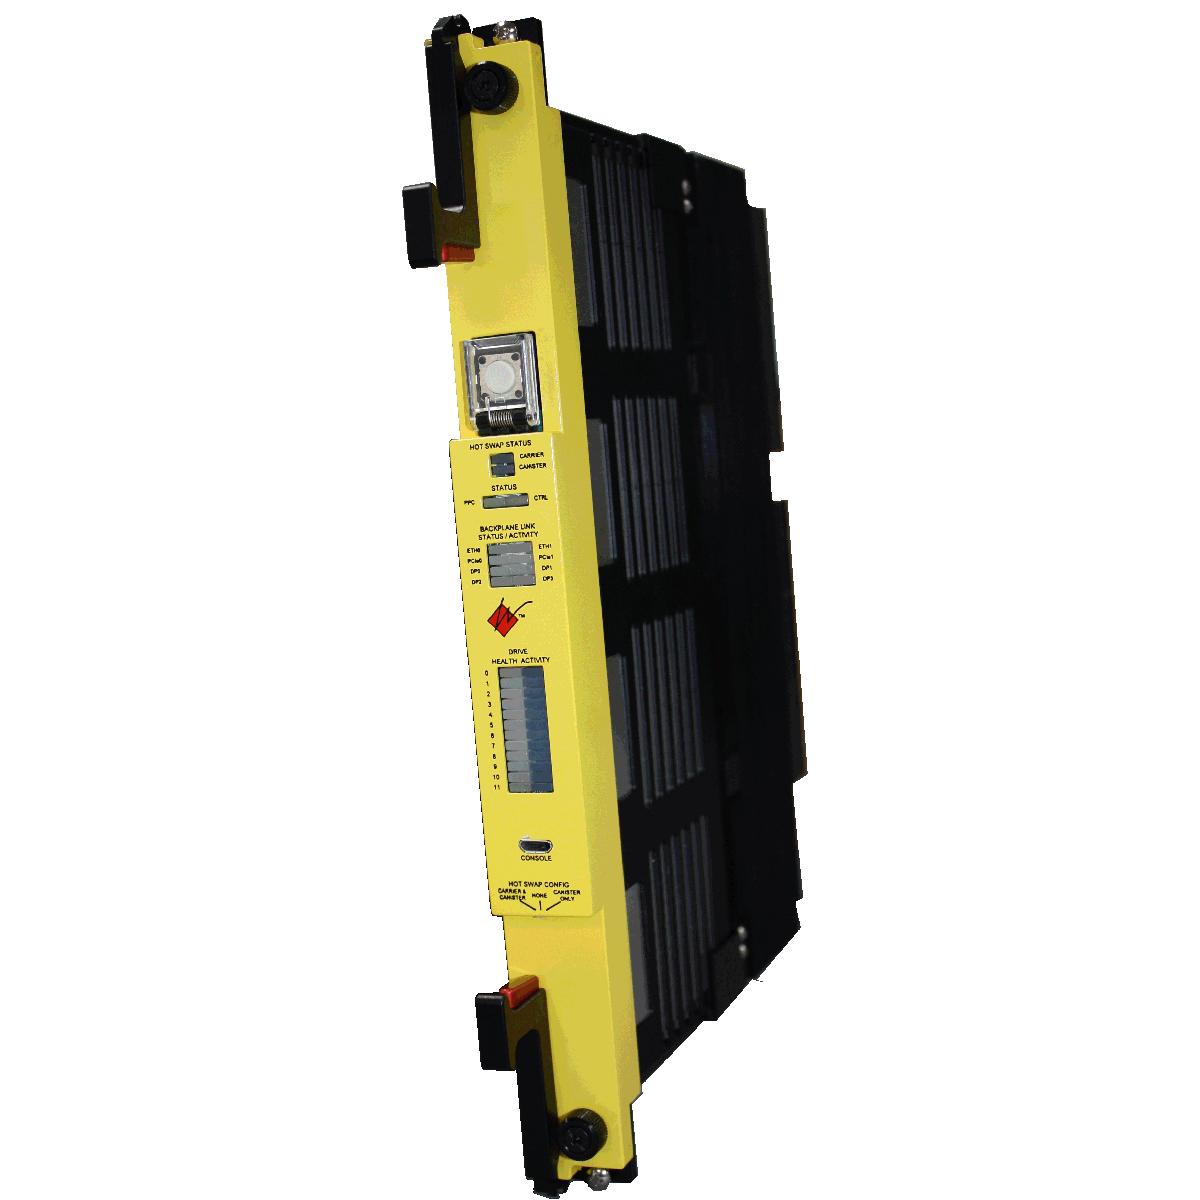 High Density High Capacity OpenVPX 6U Storage Board